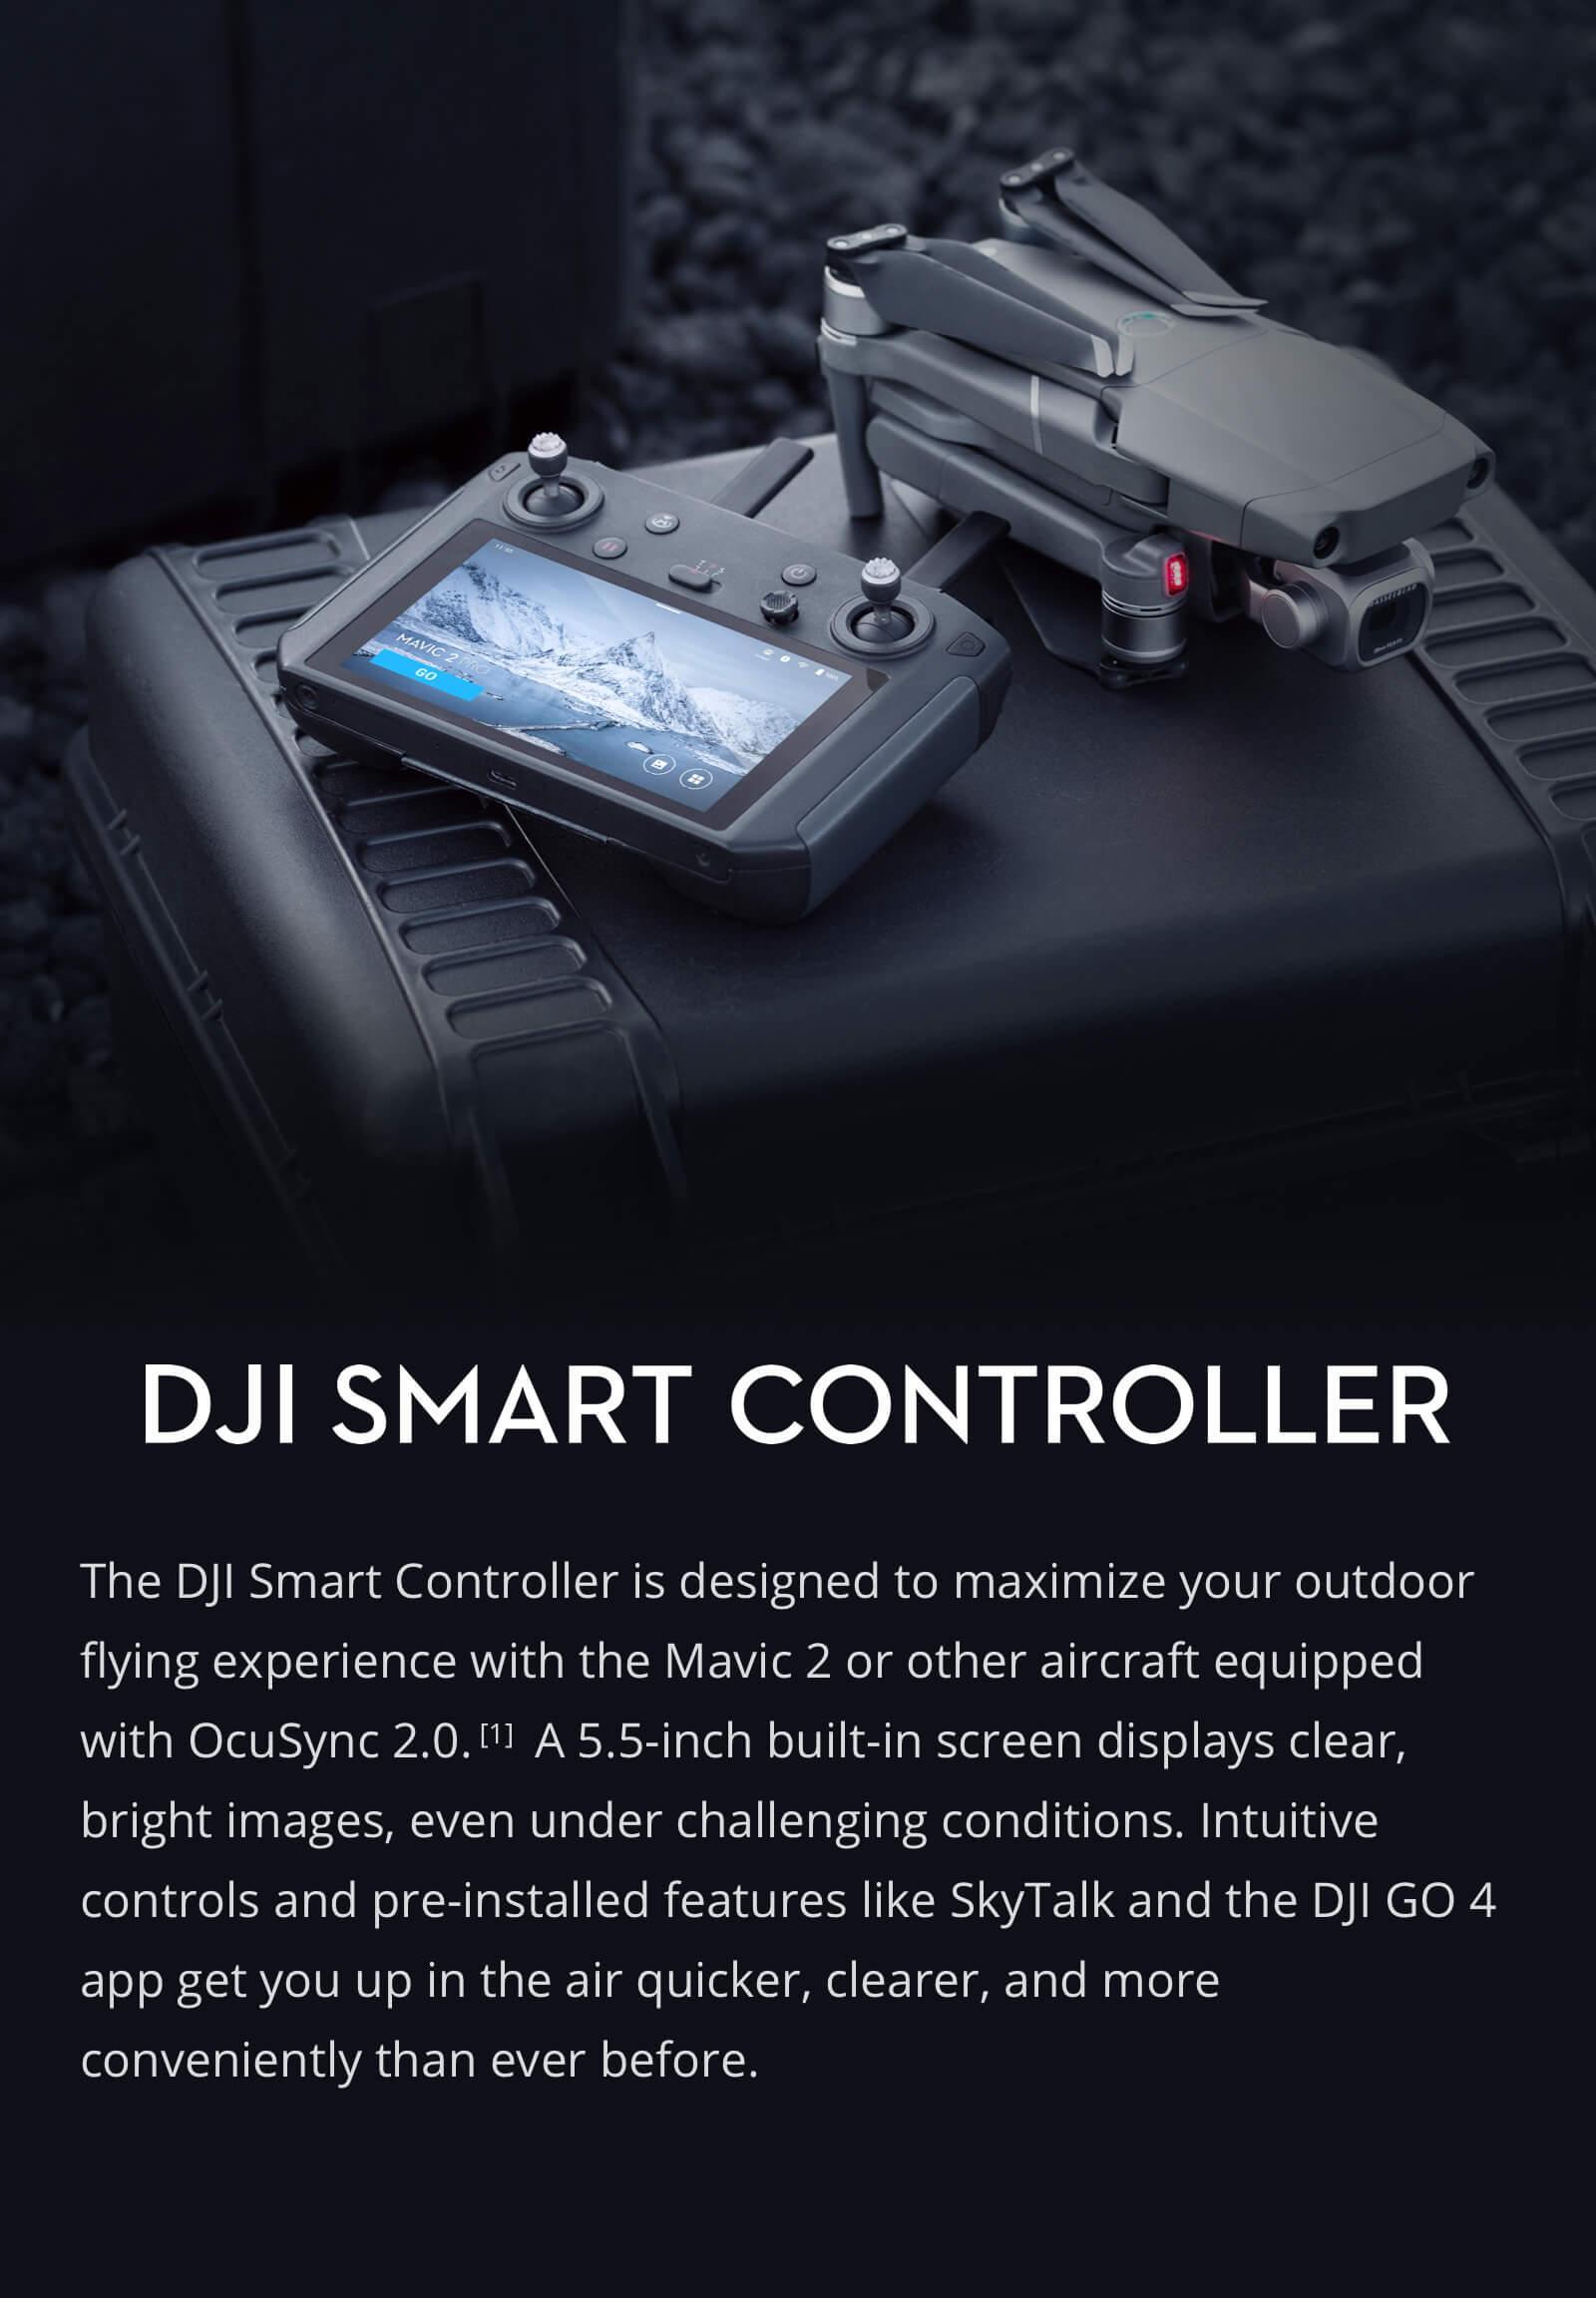 DJI Smart Controller For Mavic 2 - 100% Authentic Singapore